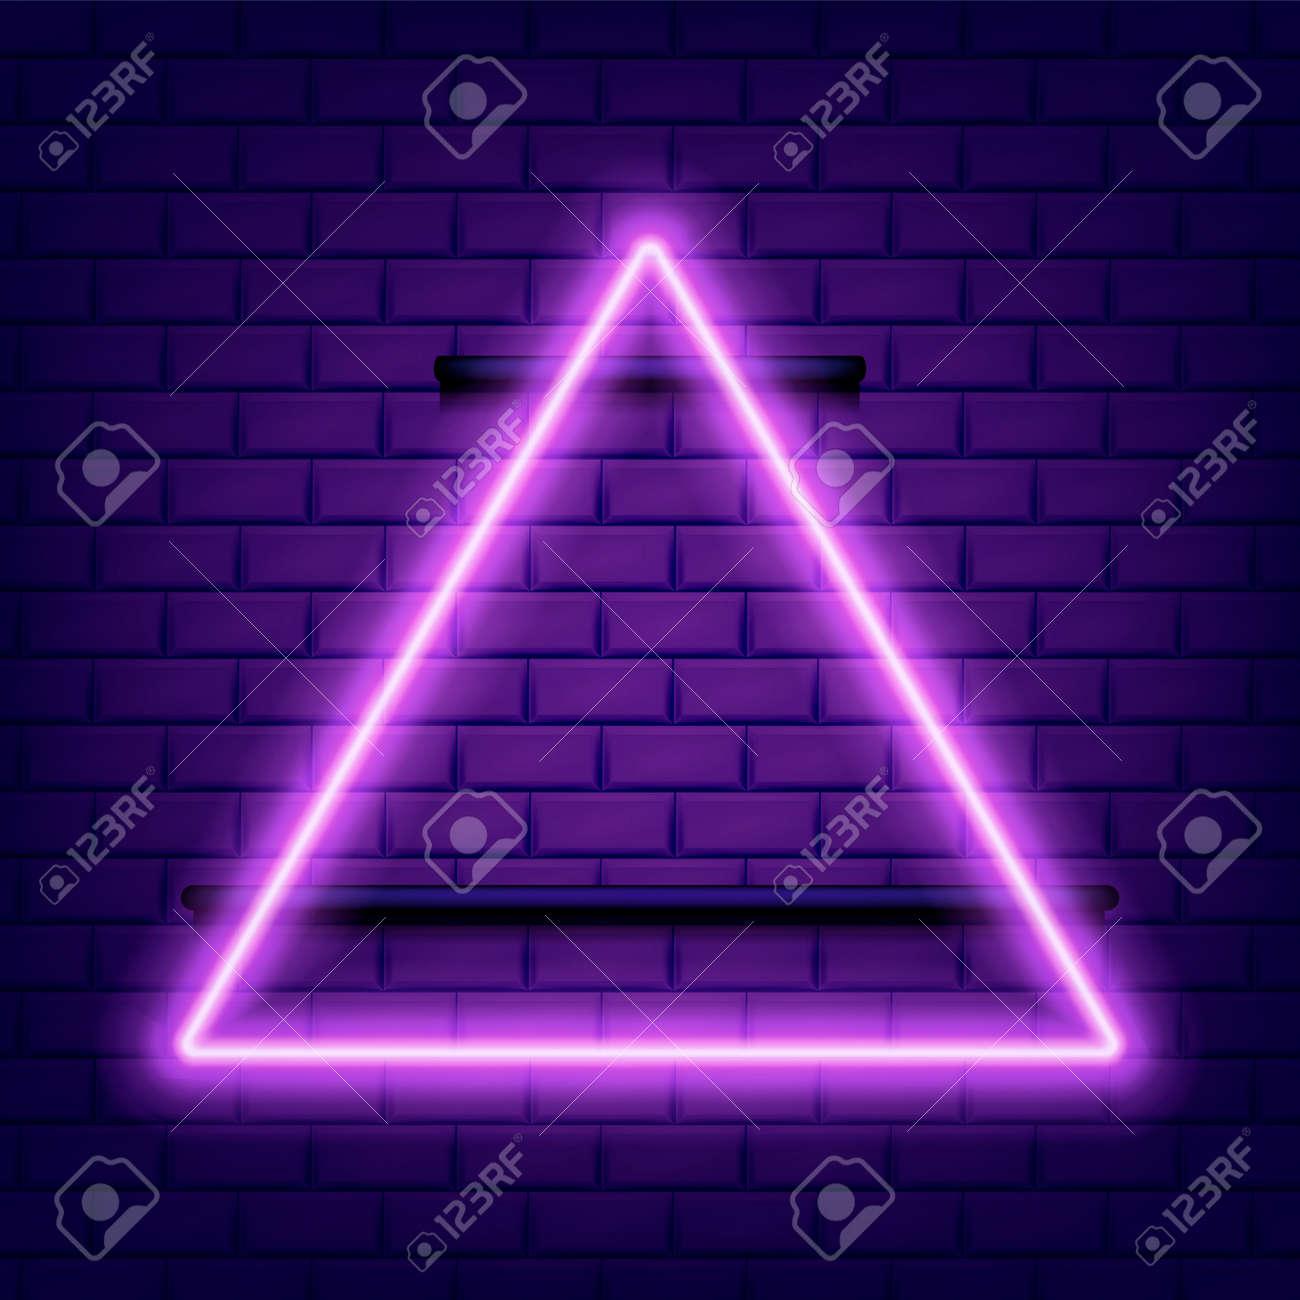 Neon glowing triangle on dark isolated. Vector illustration. - 164872118